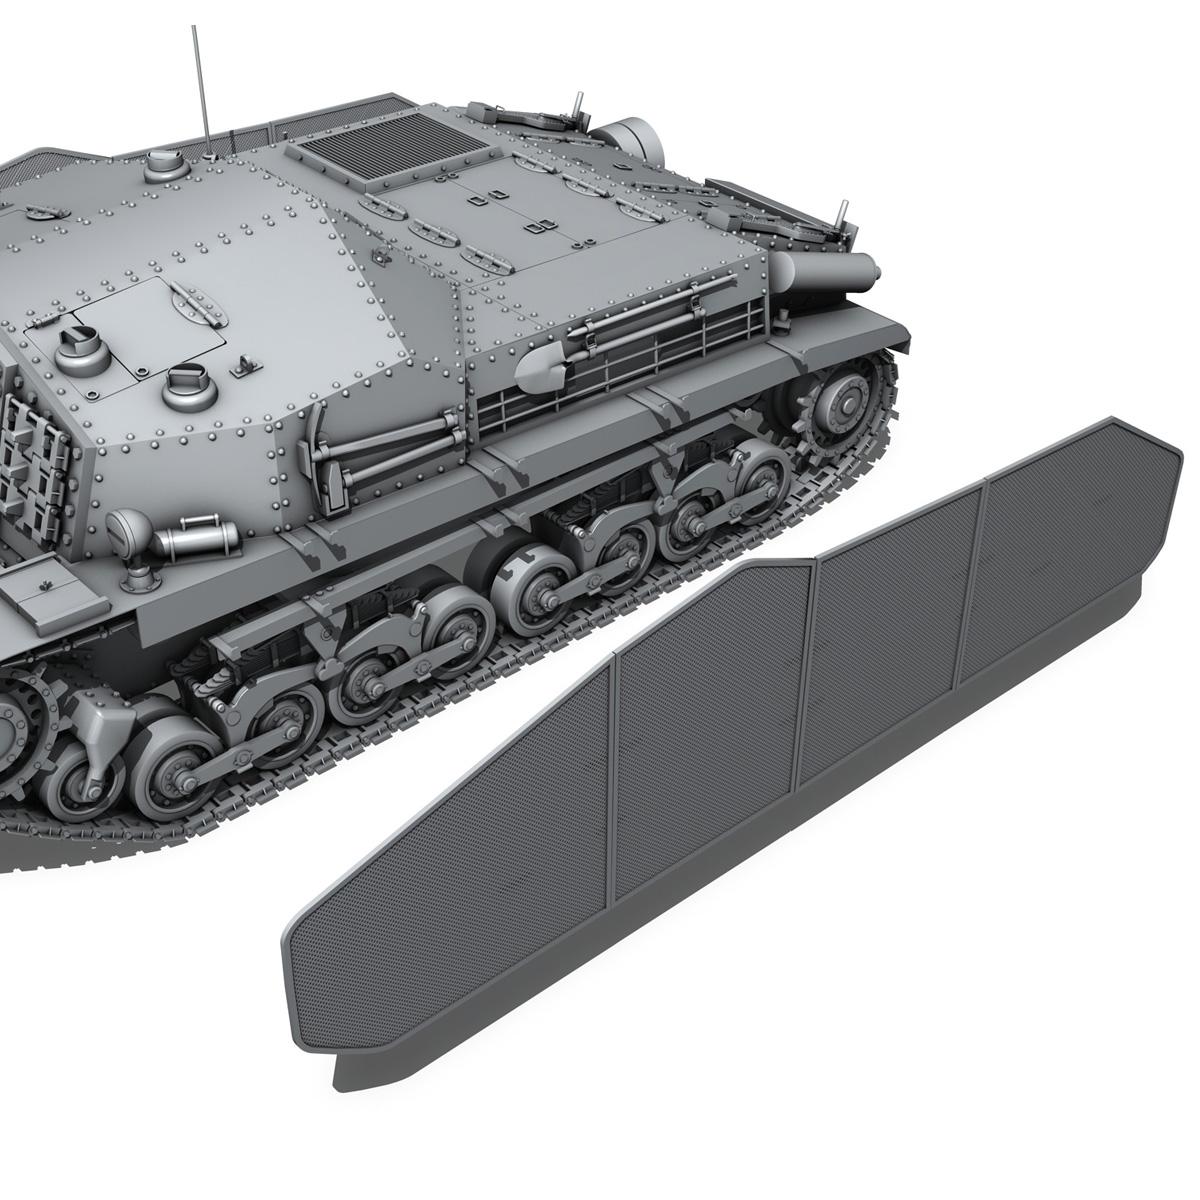 43m zrinyi ii - Macar hücum silahı 3d model 3ds fbx c4d lwo obj 251637